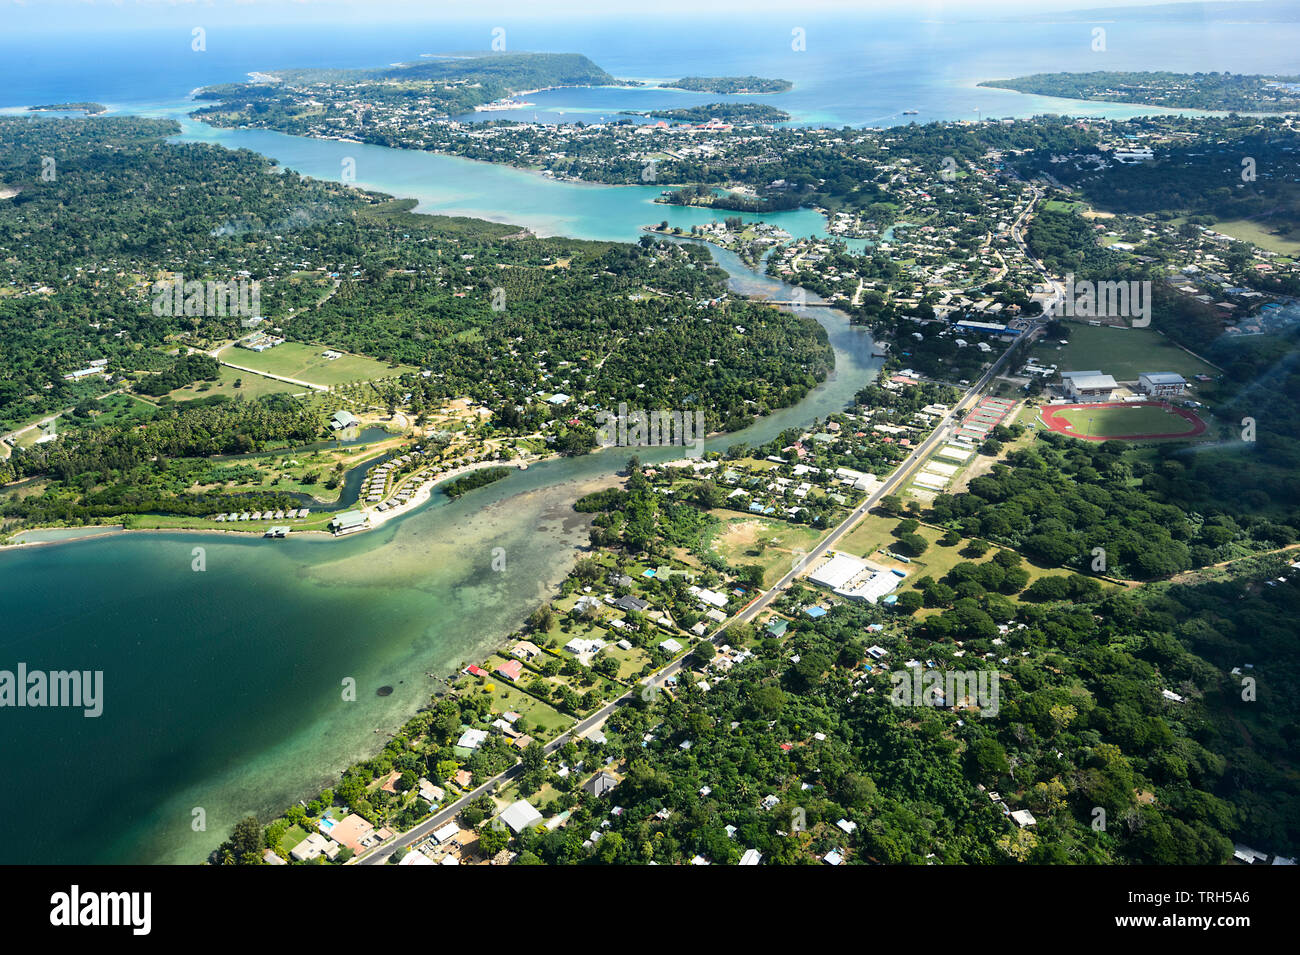 Aerial view of Port Vila, Efate Island, Vanuatu - Stock Image